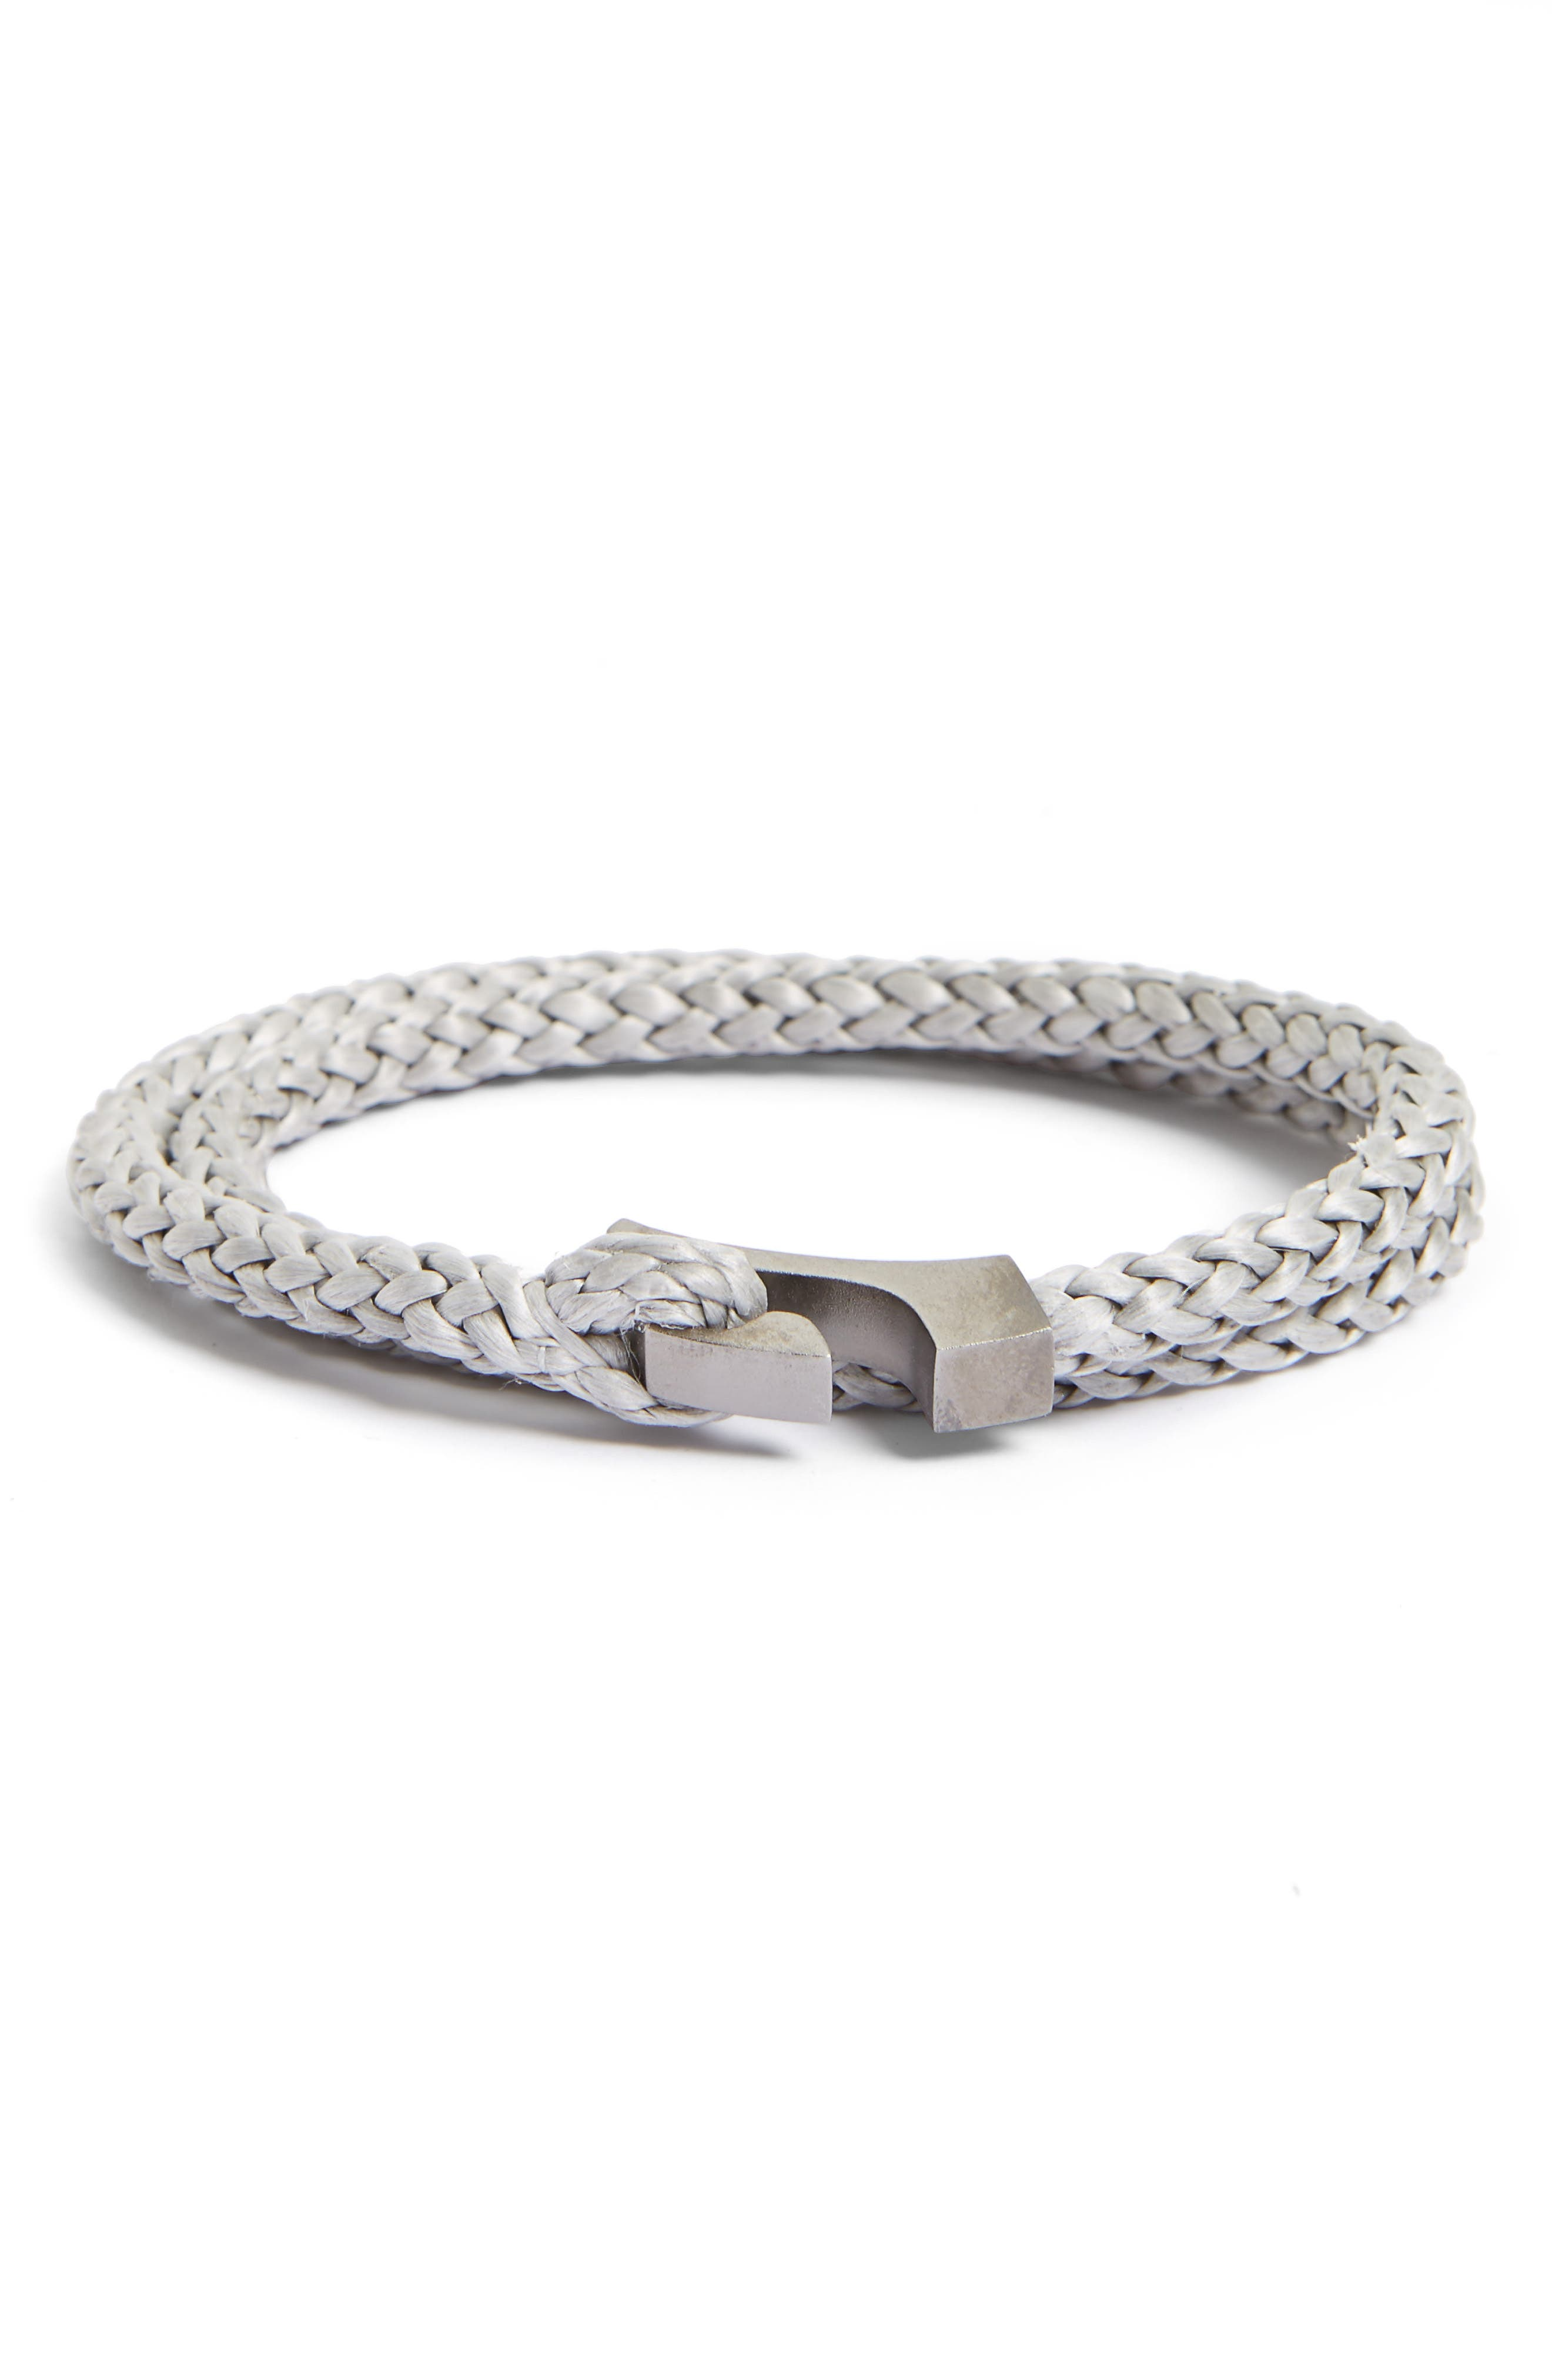 Miansai Ipsum Braided Nylon Bracelet